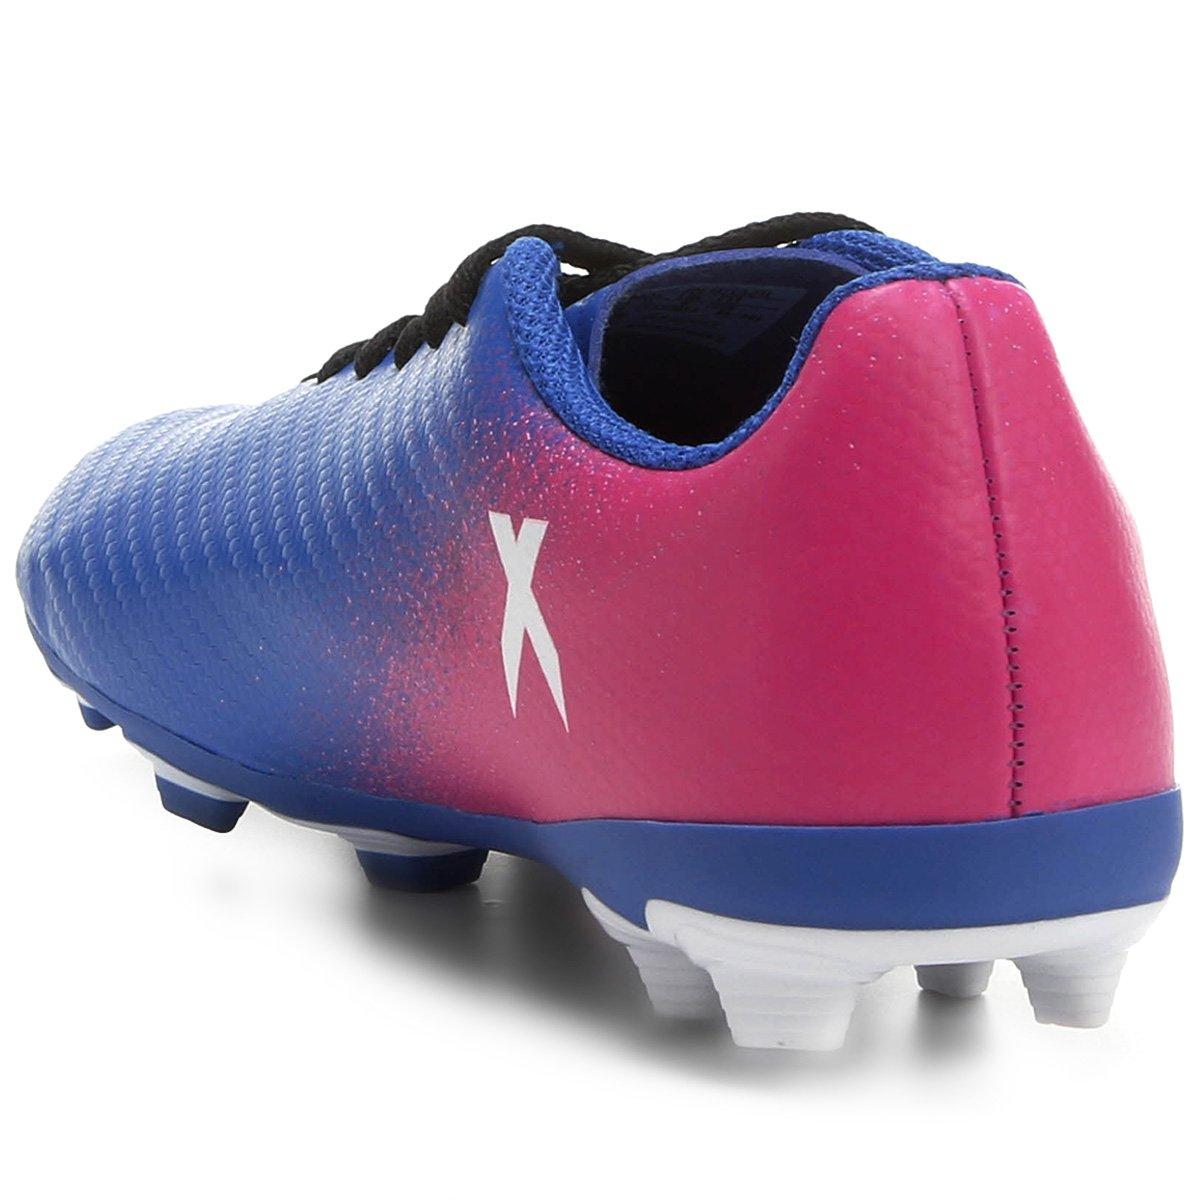 Chuteira Campo Juvenil Adidas X 16 4 FXG - Azul e Pink - Compre ... 0c10715c22130